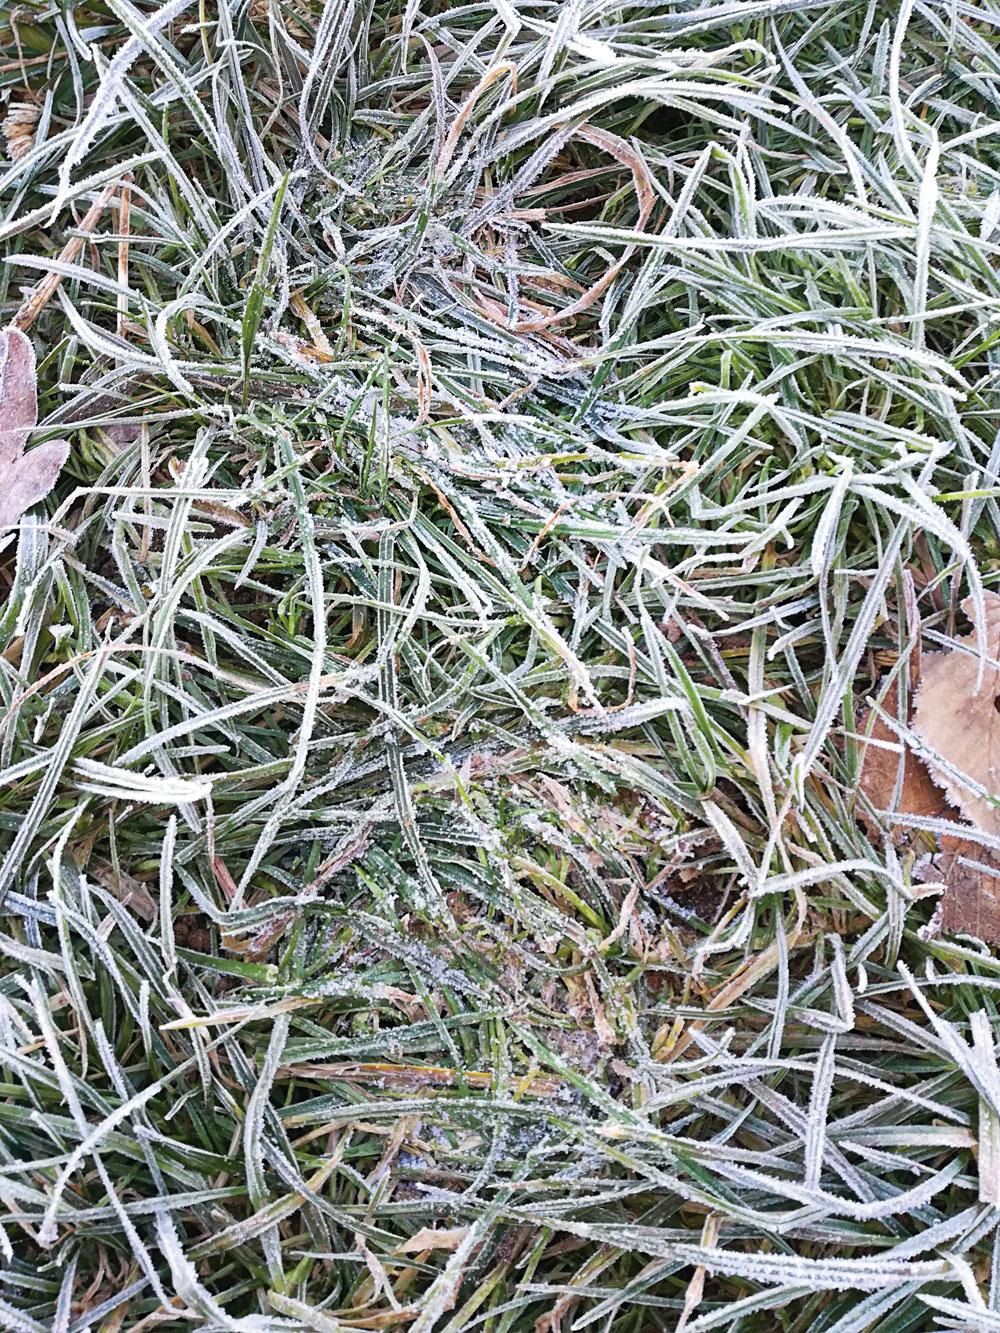 A fresh track left on frozen grassland runs vertically in this photo.